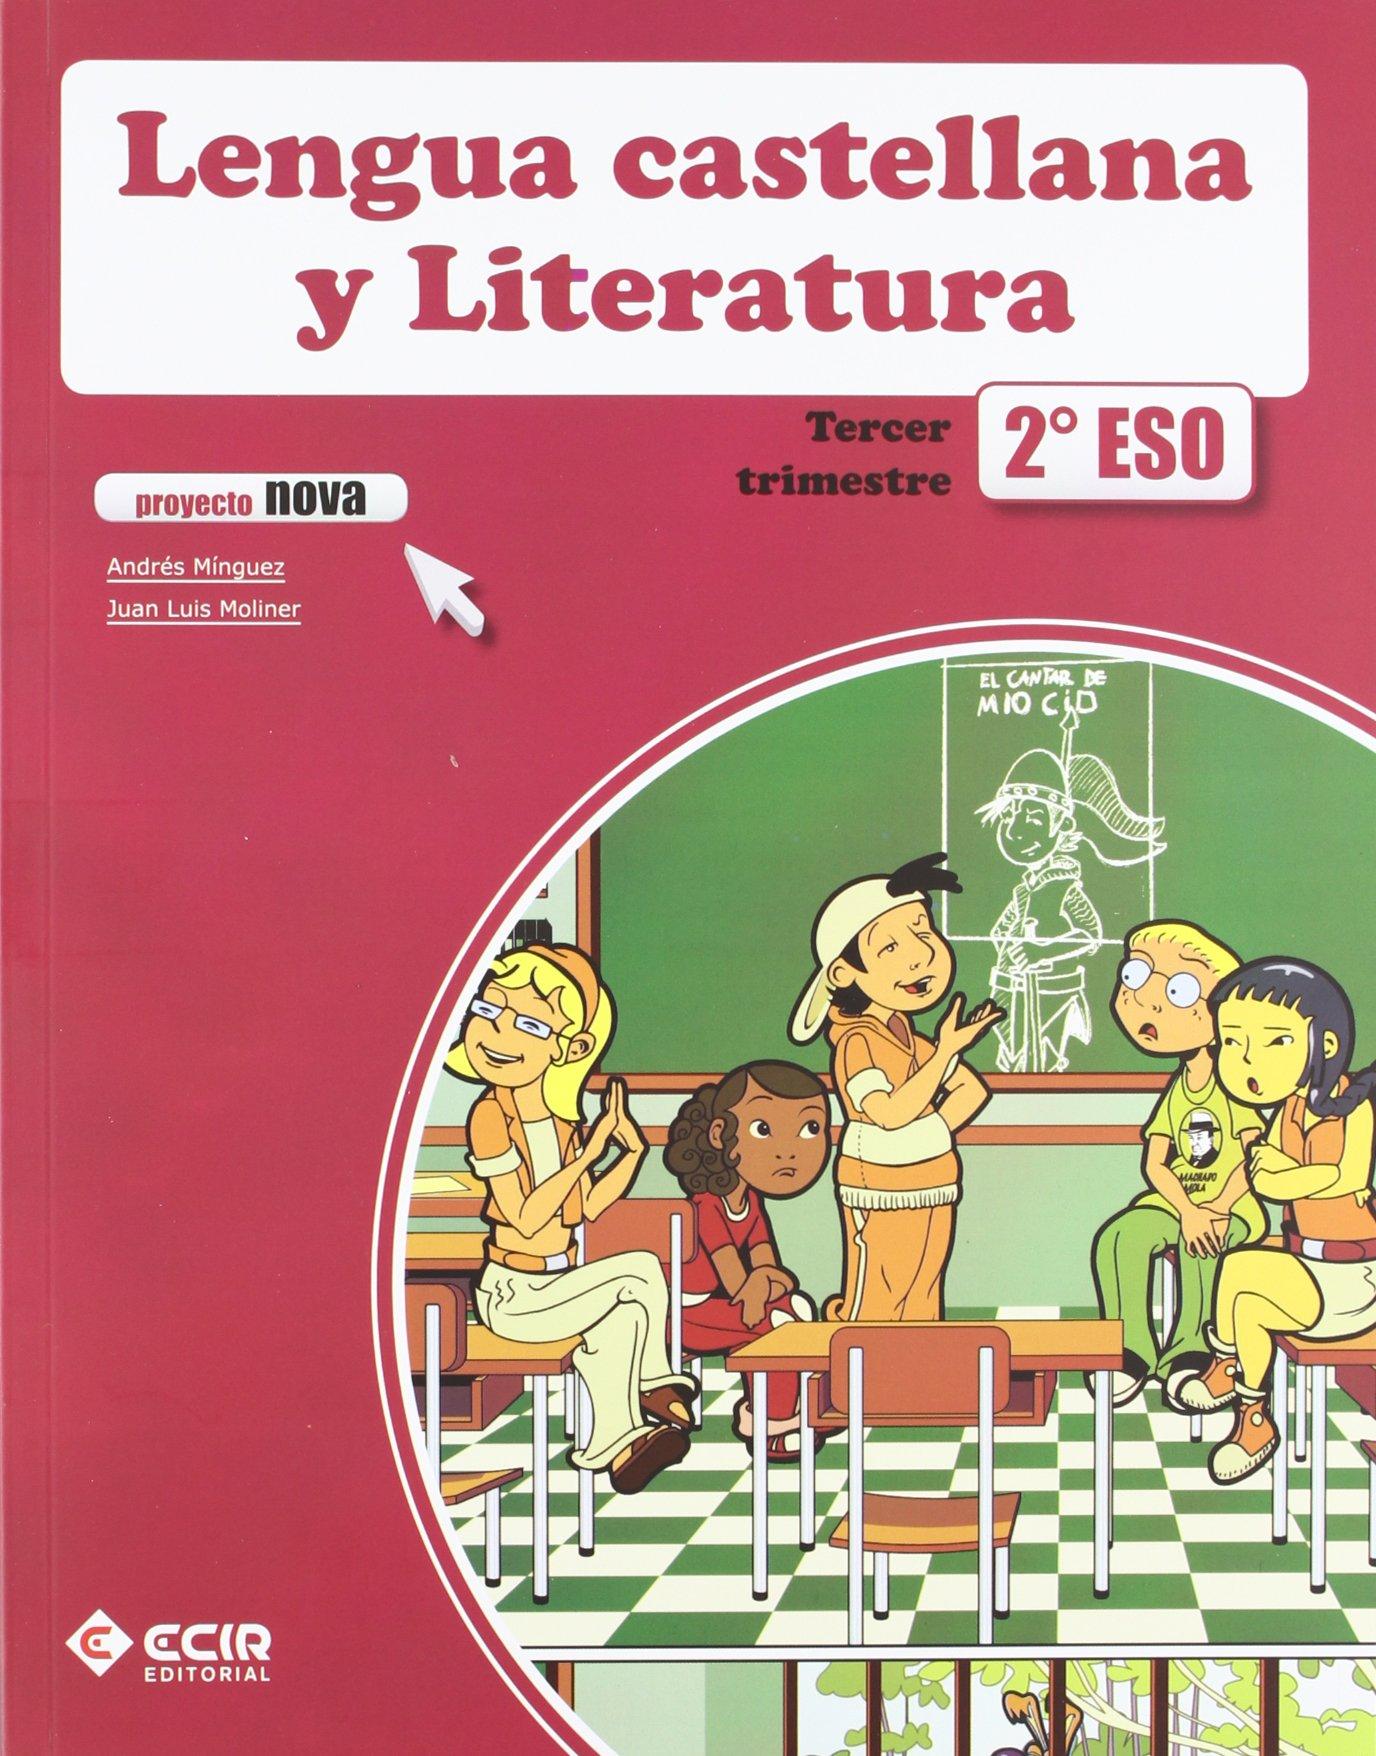 LENGUA CASTELLANA Y LITERATURA 2º E.S.O. - PROYECTO NOVA - 9788498266443: Amazon.es: MÍNGUEZ GALLEGO, ANDRÉS, MOLINER SOSPEDRA, JUAN LUÍS: Libros